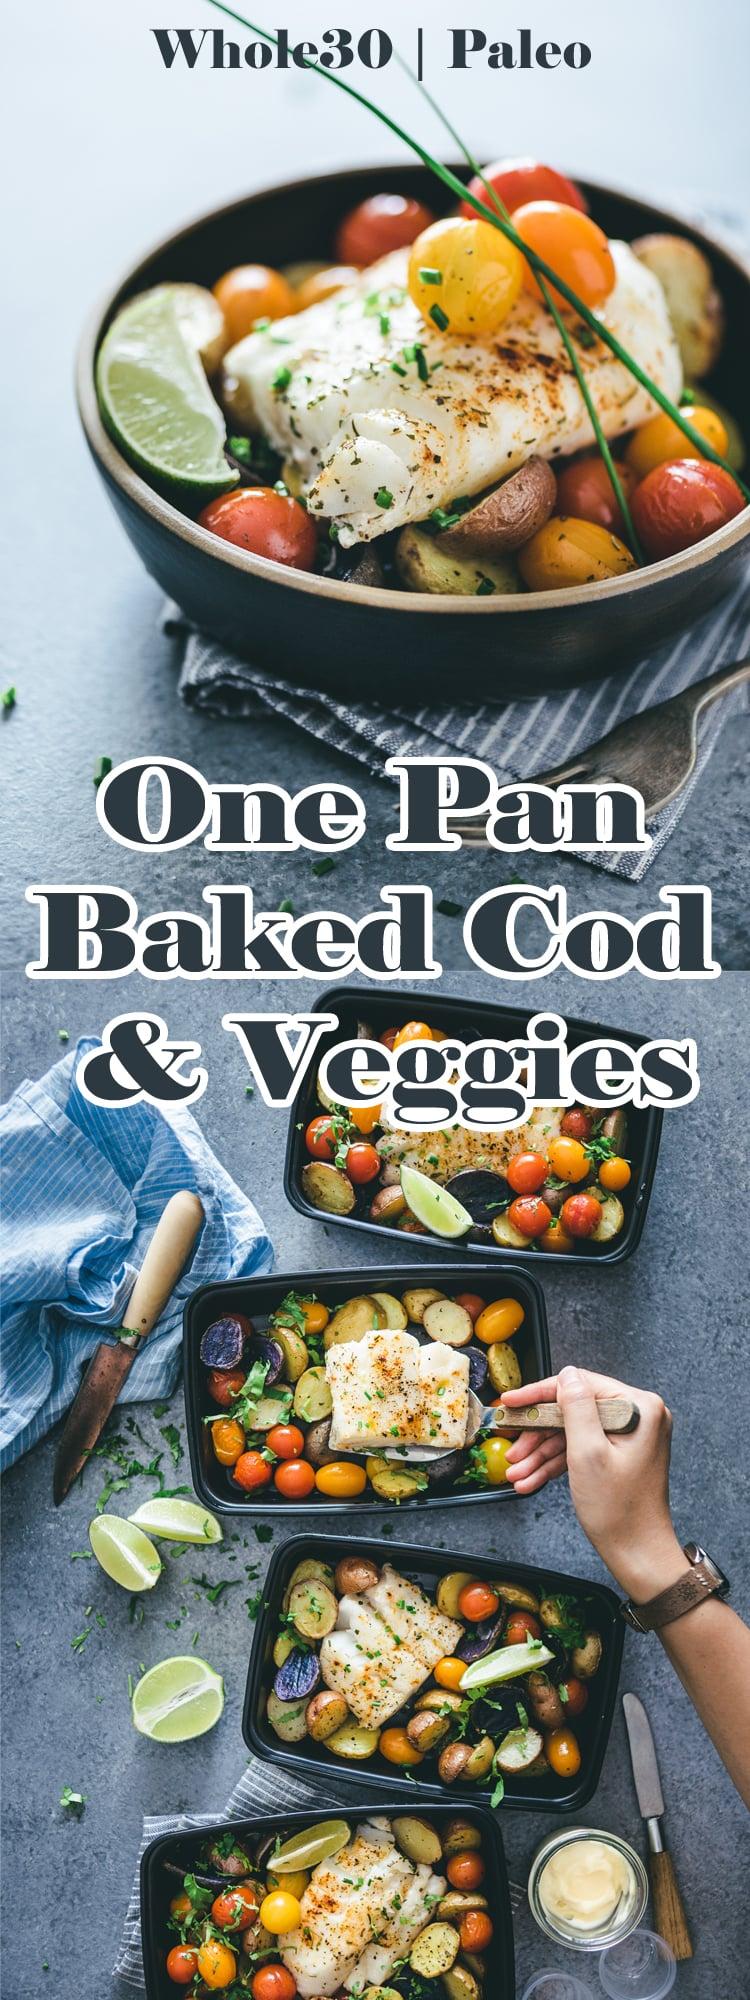 Whole30 Paleo Sheet Pan Recipe